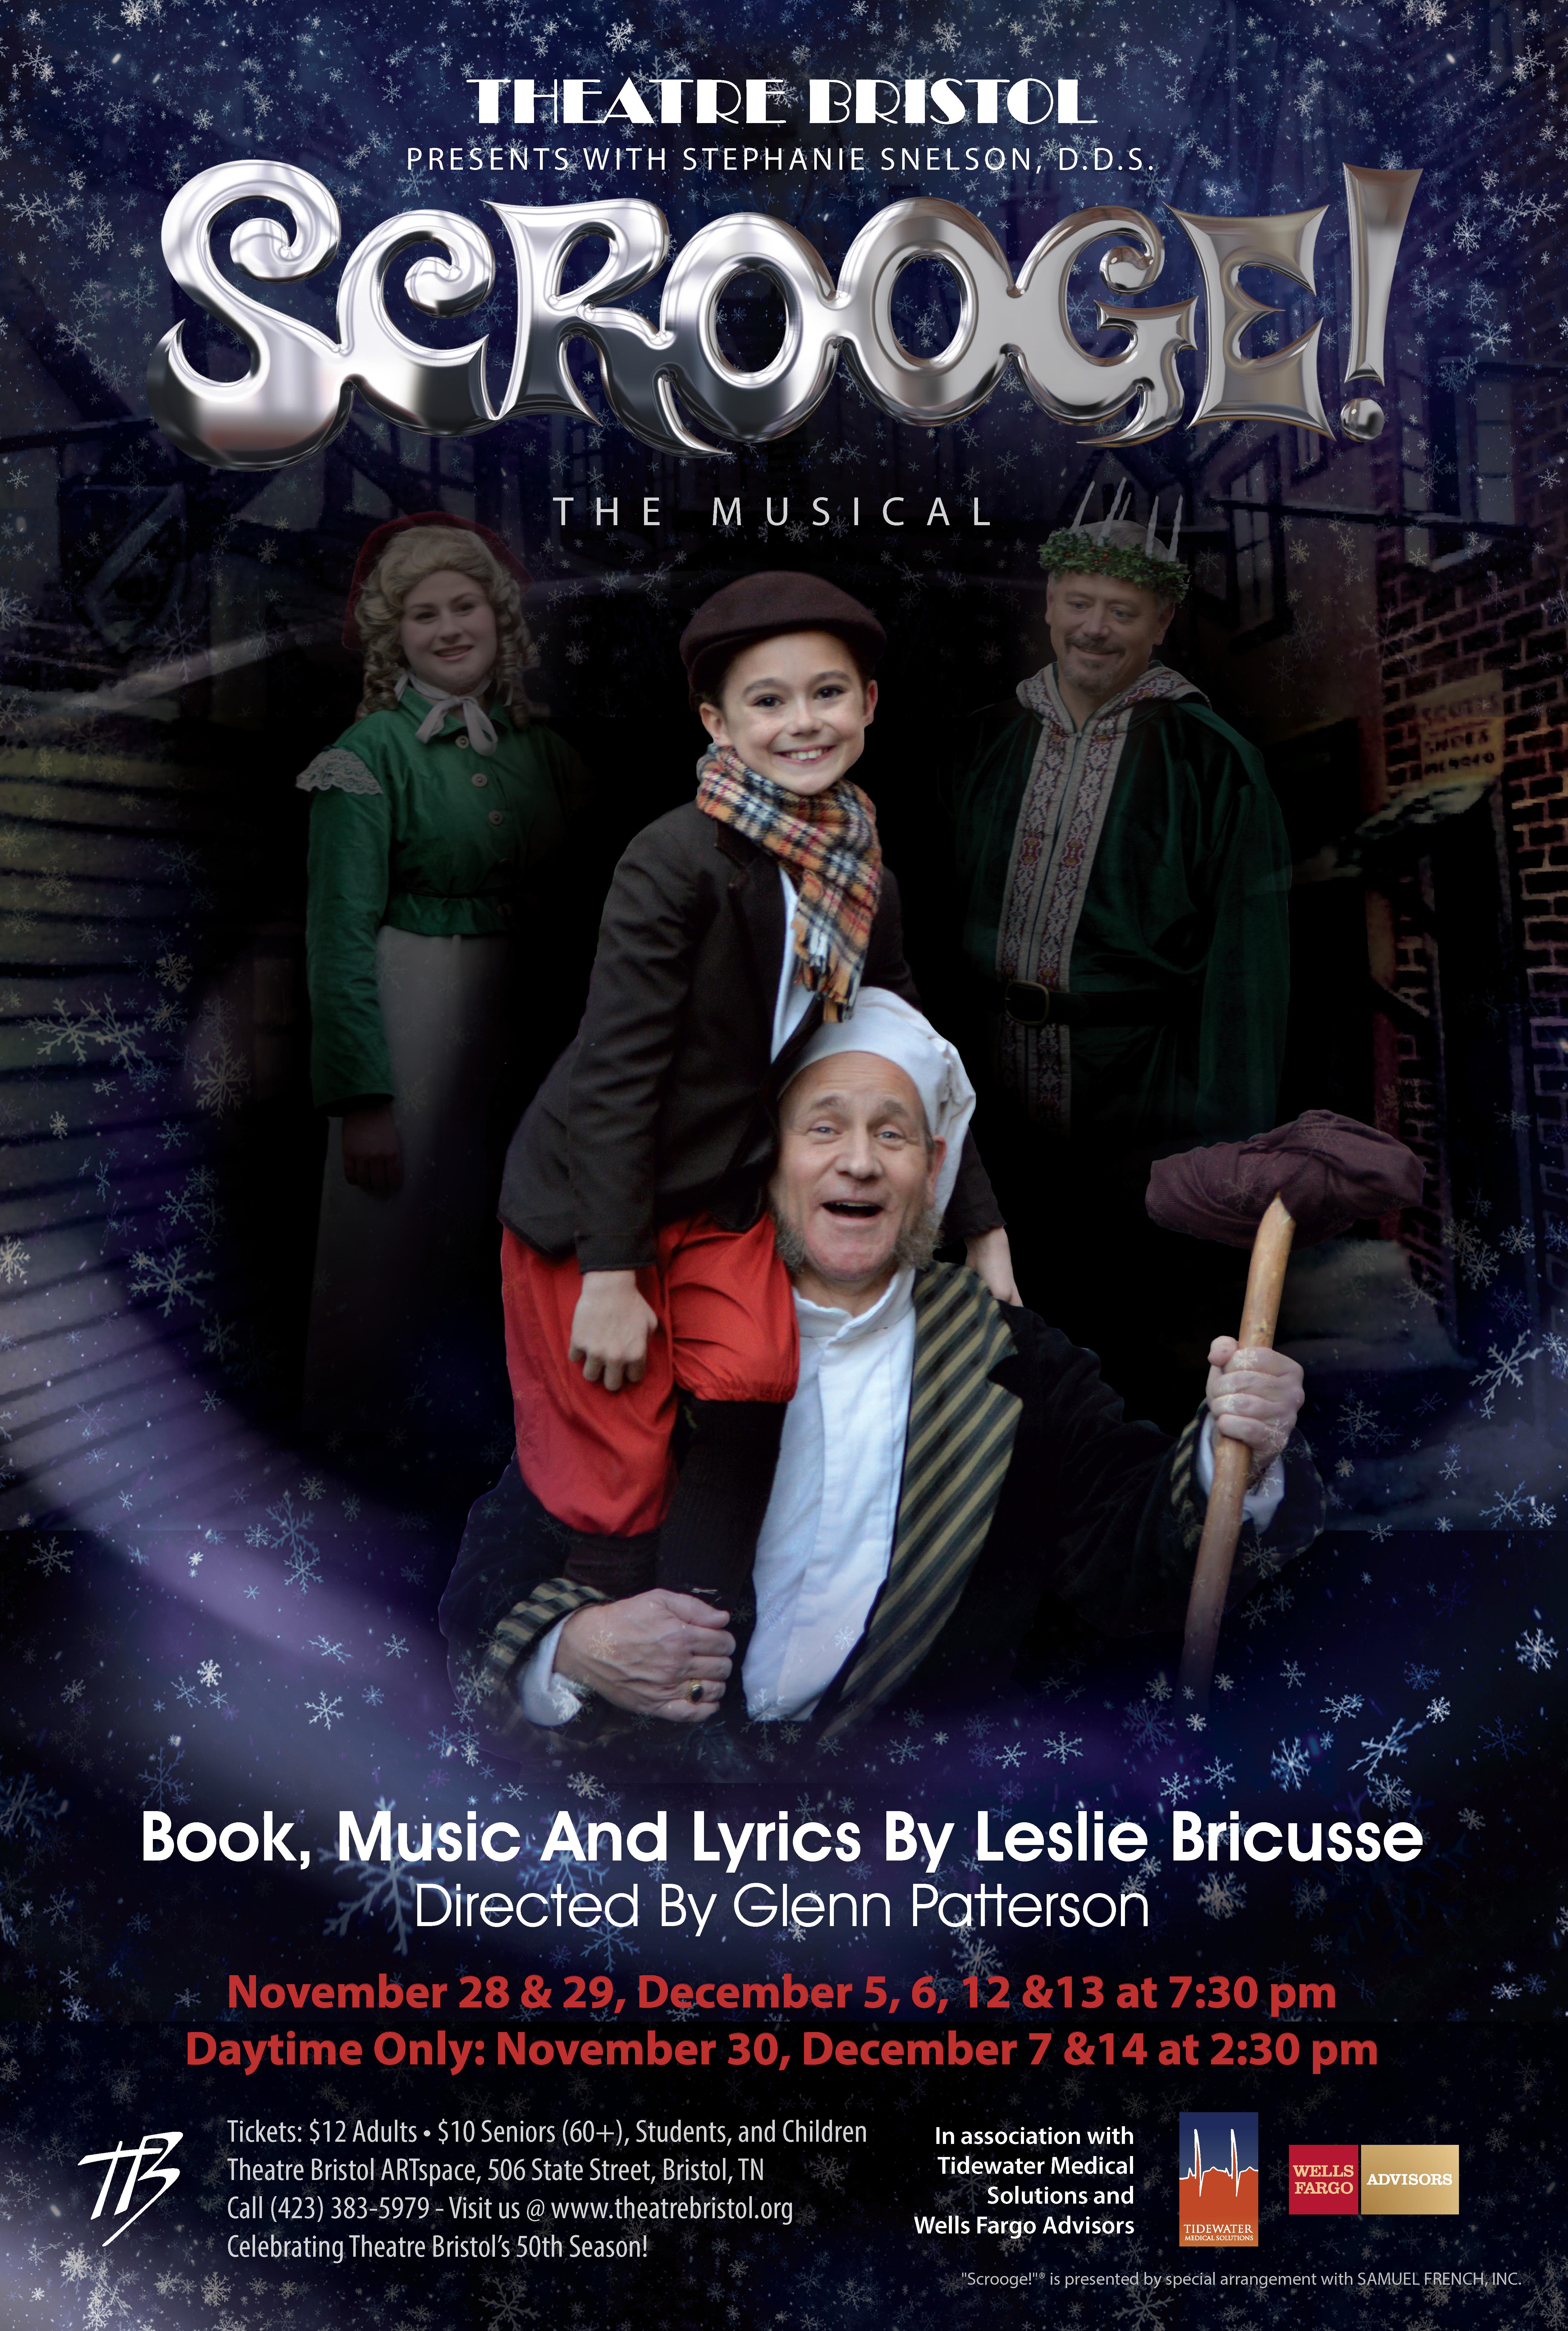 Theatre Bristol's Scrooge! The Musical 2014. Opens Nov 28